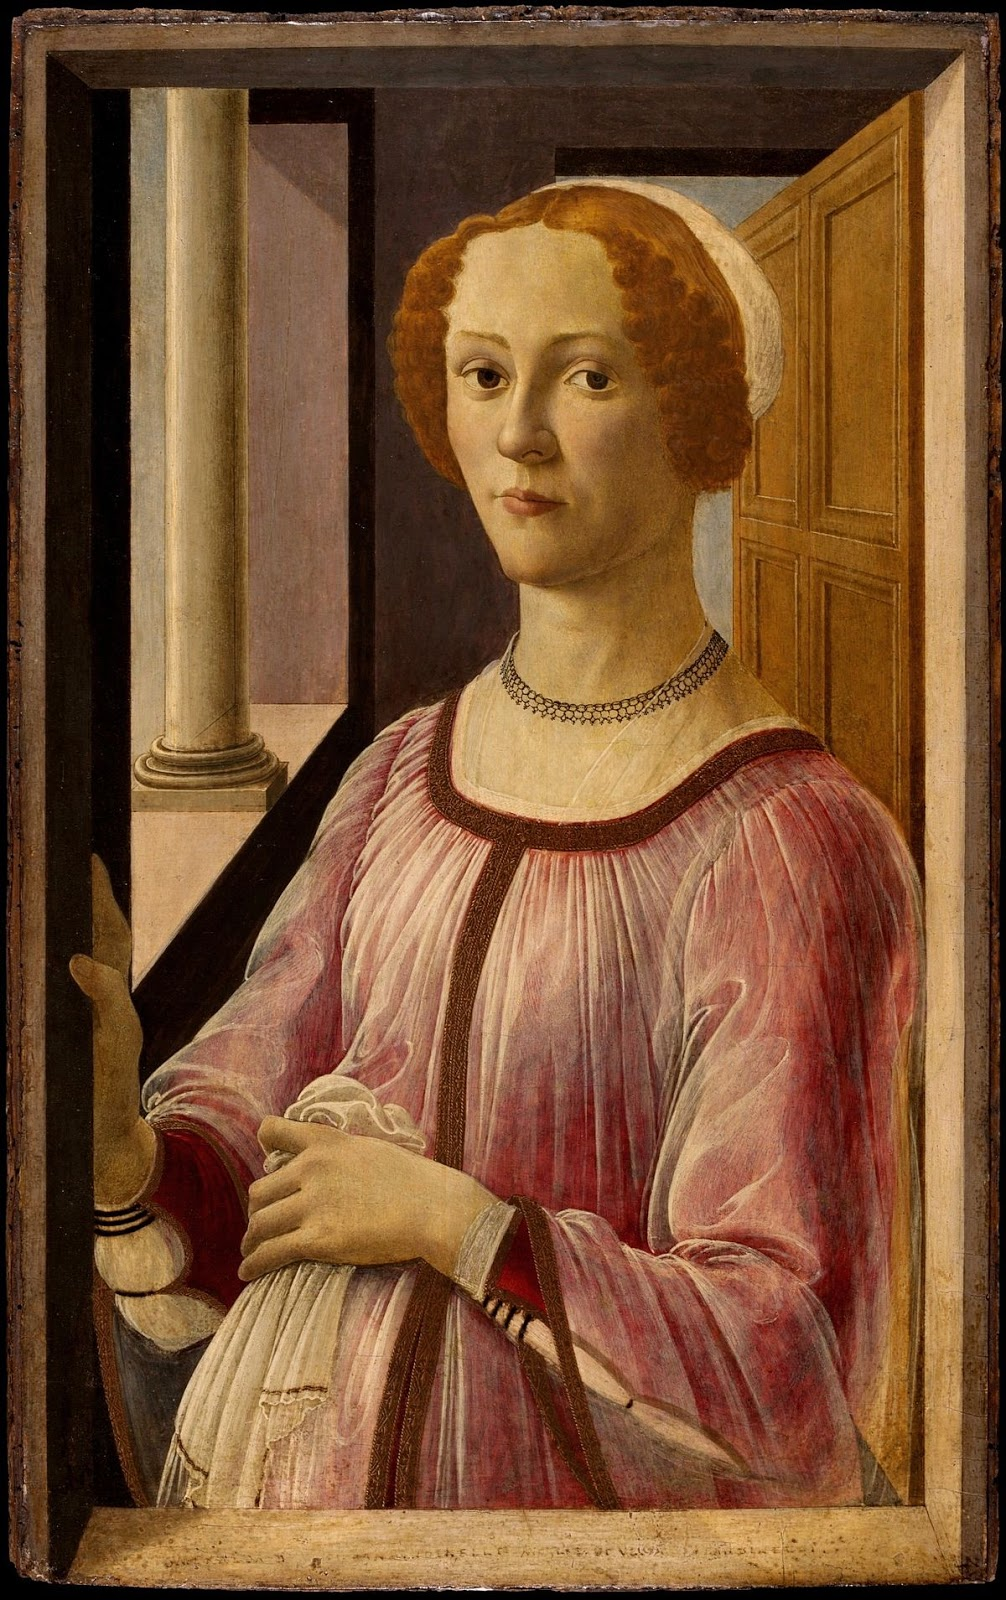 Retrato de Esmeralda Brandini. Sandro Botticelli. Hacia 1475, Temple sobre tabla, 65,7x41 cm. Londres, Victoria and Albert Museum.